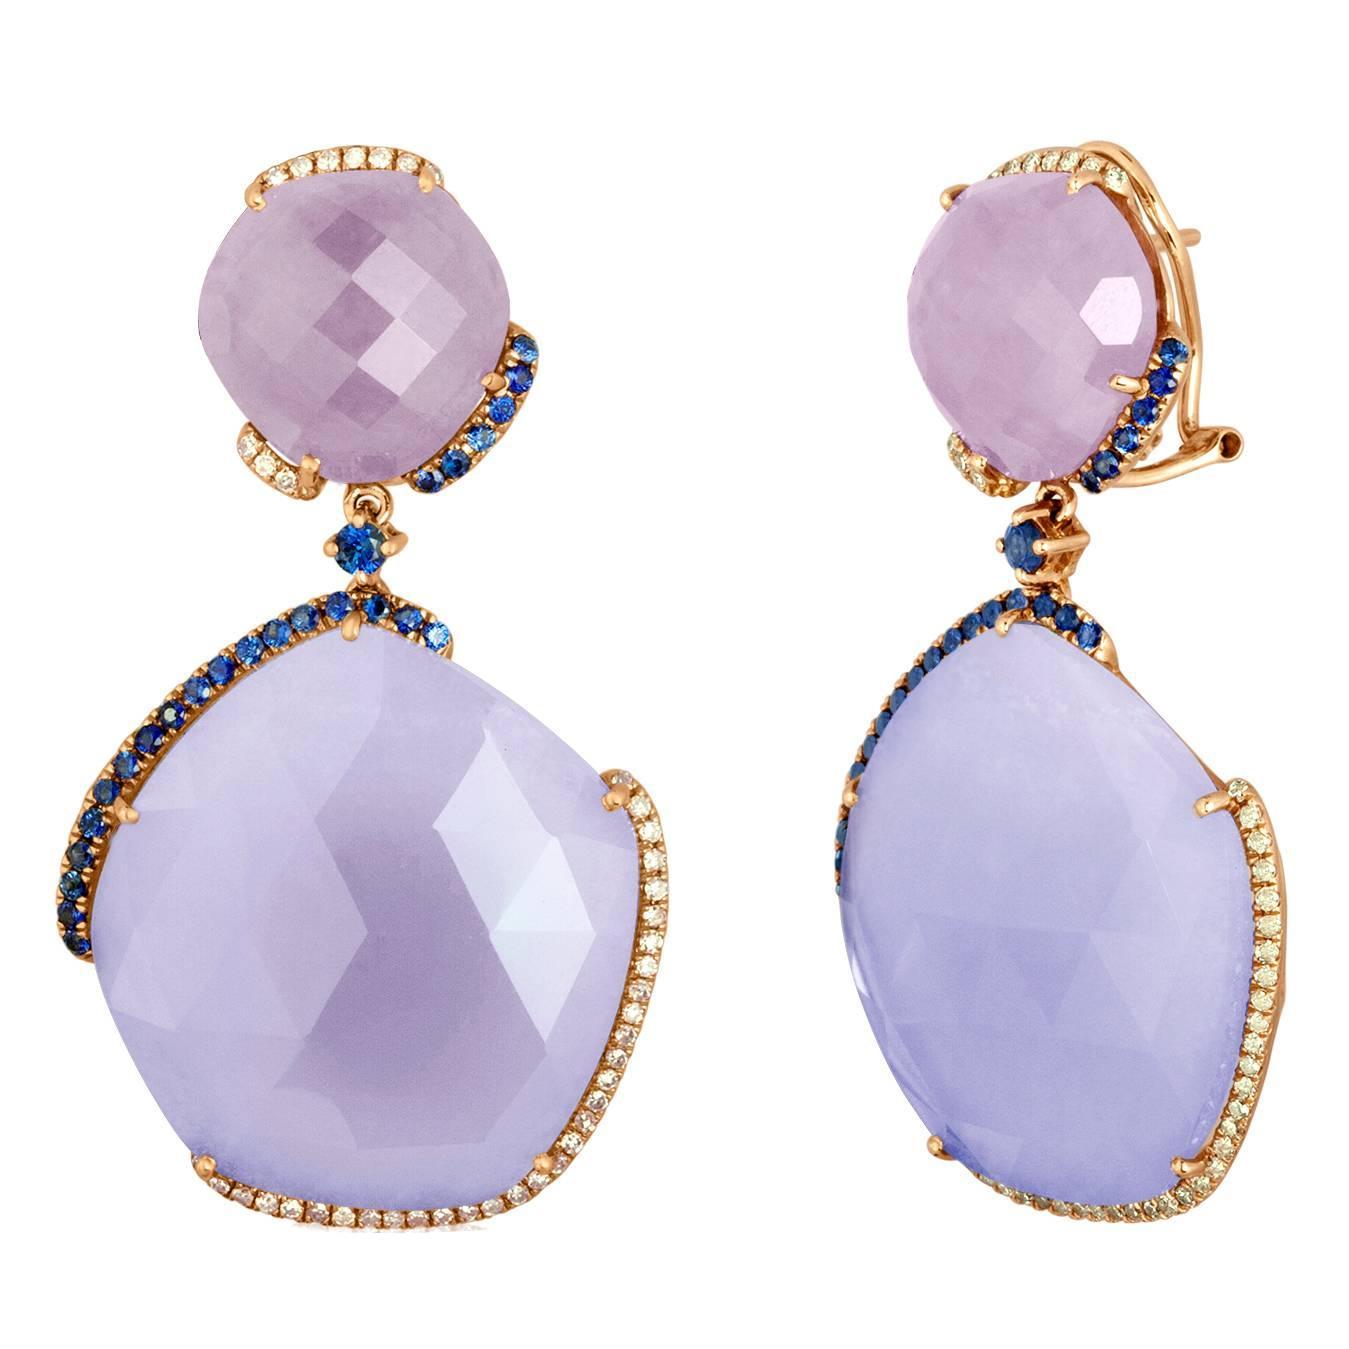 61.22 Carats Chalcedony Purple Jade Sapphire Gold Drop Earrings